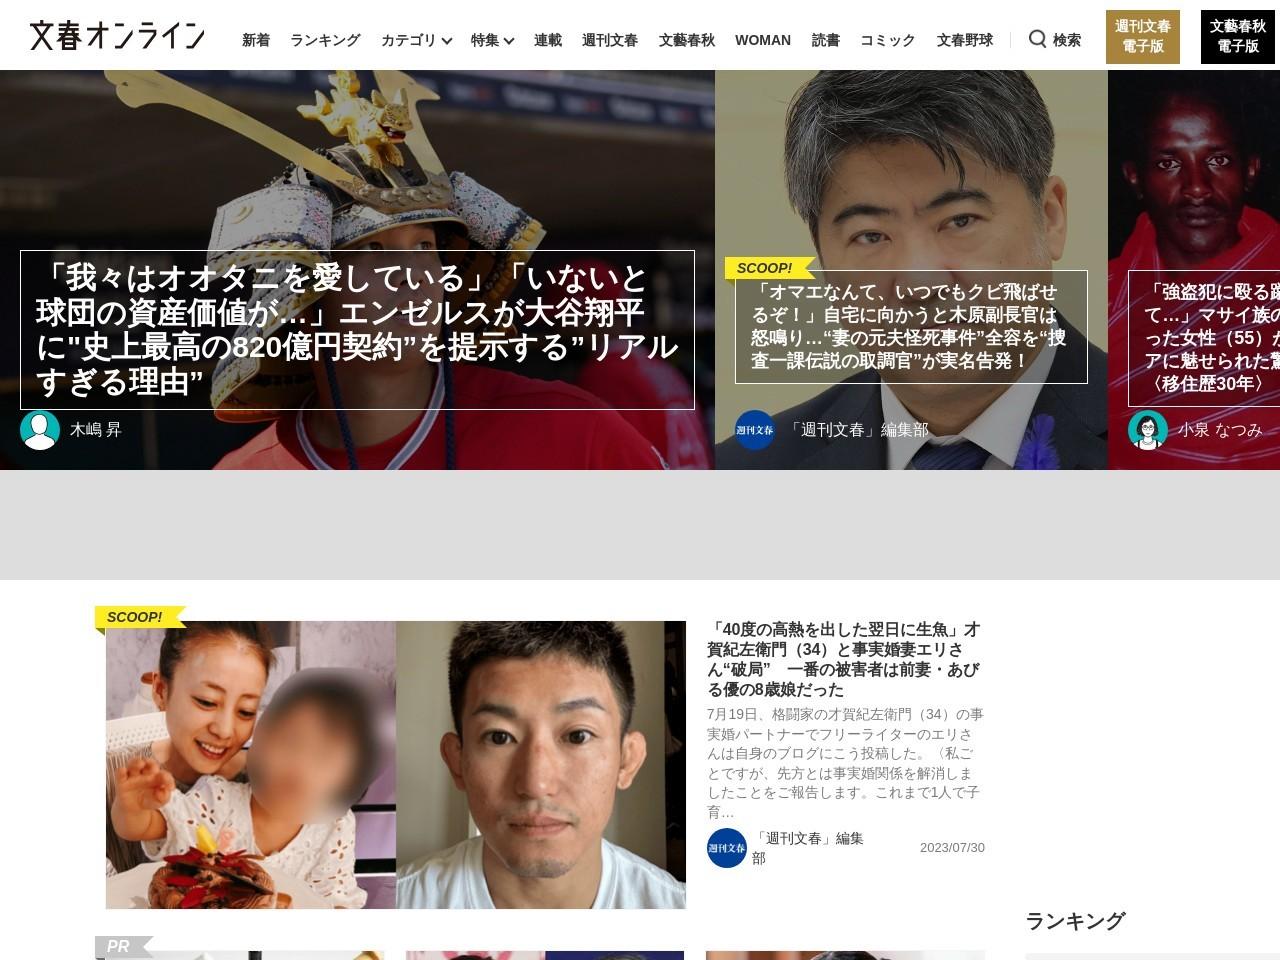 「NHK新元号『安』めちゃ推しの怪」は本当か――気になる新元号の「出典」はどうなる?